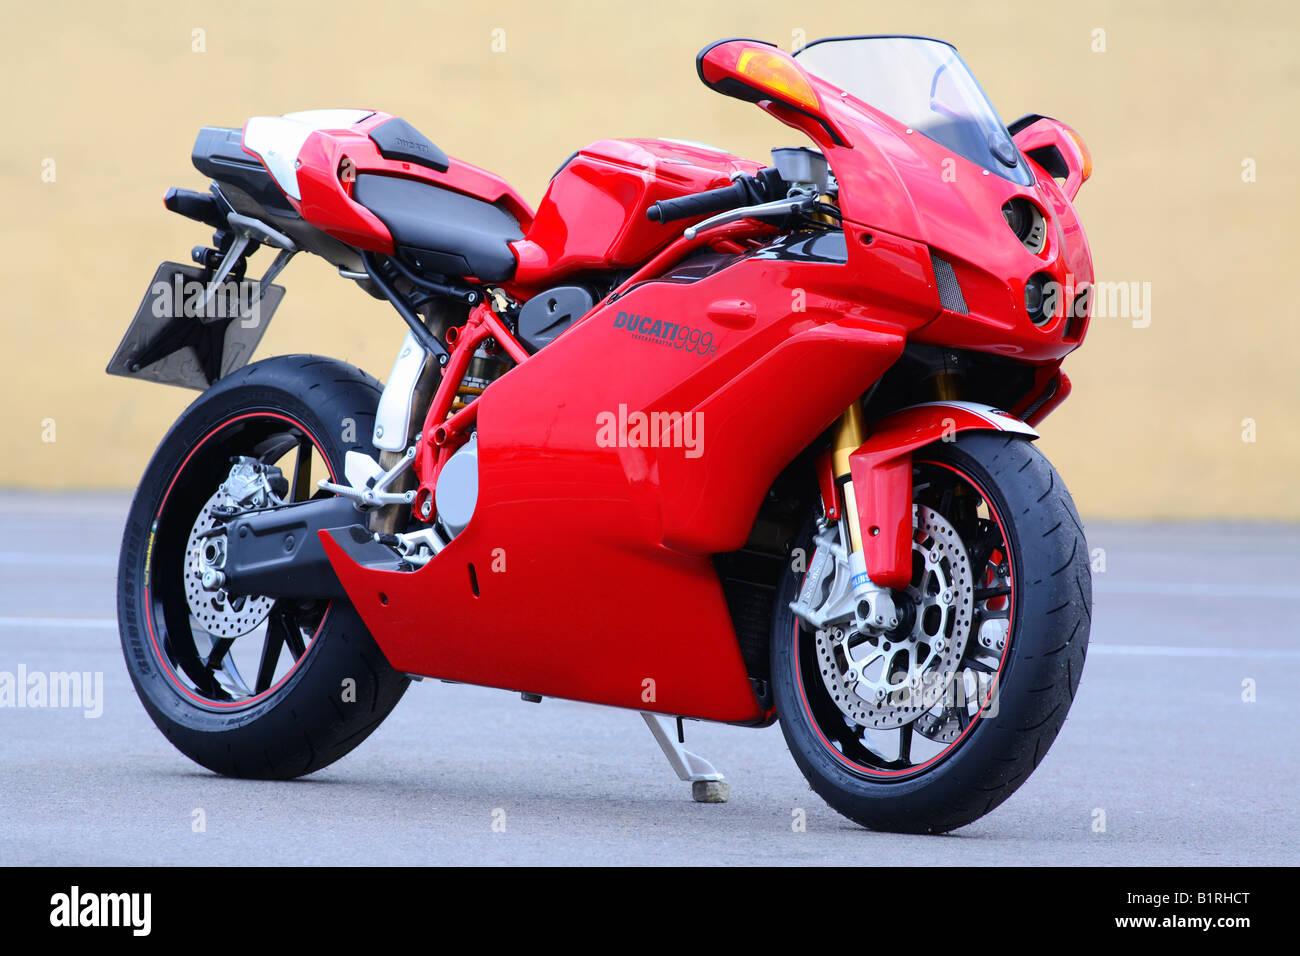 Motorbike Ducati 999R - Stock Image